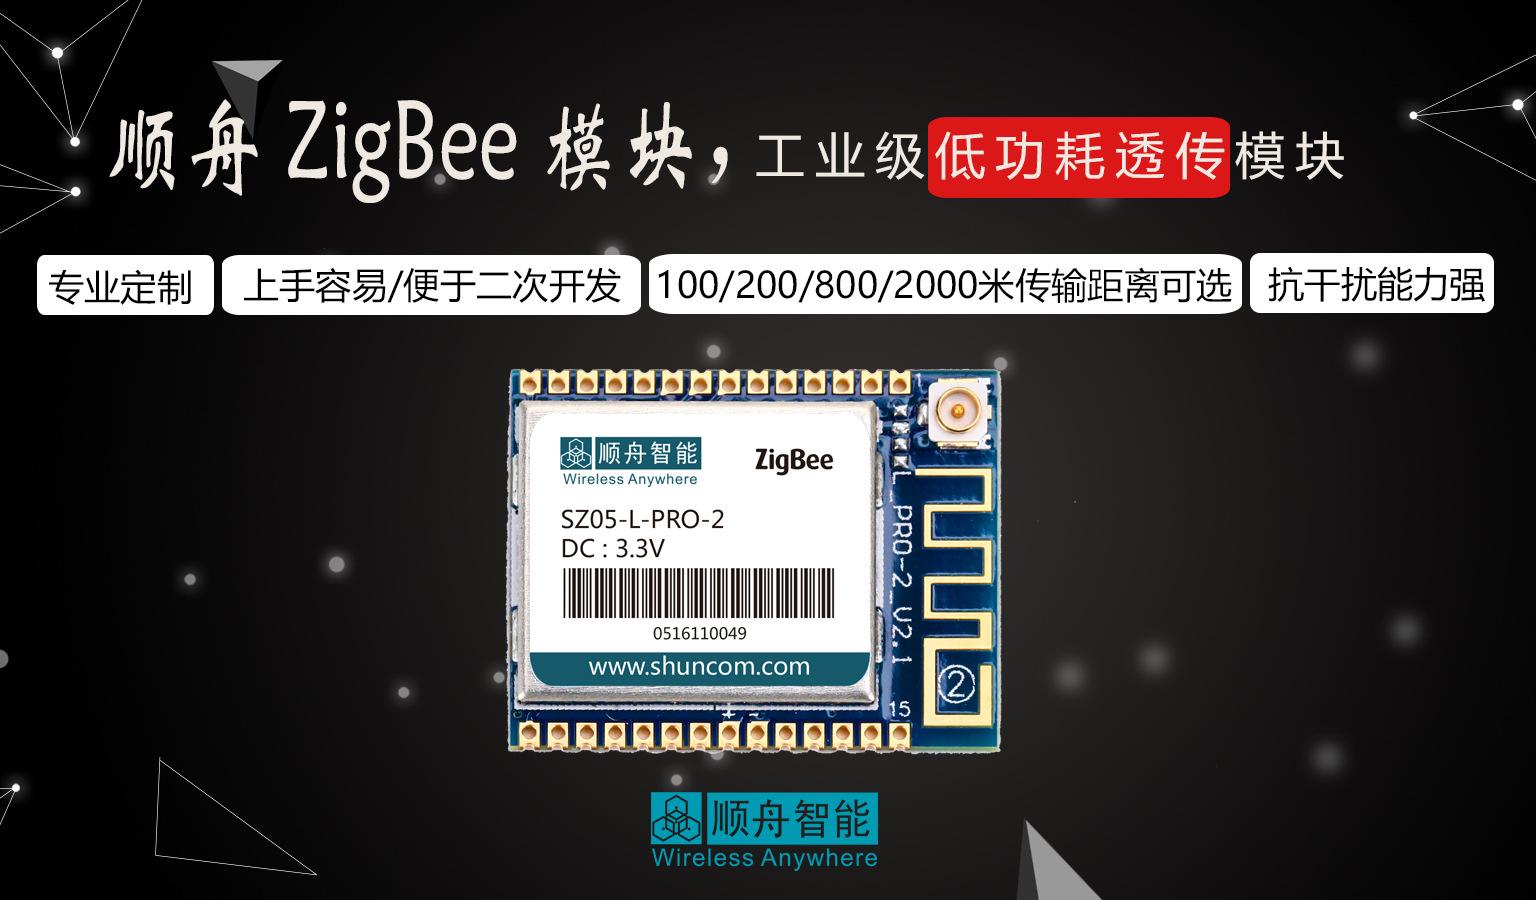 zigbee透传模块厂家公司 物联网无线通信zigbee模块 利于二次开发示例图2